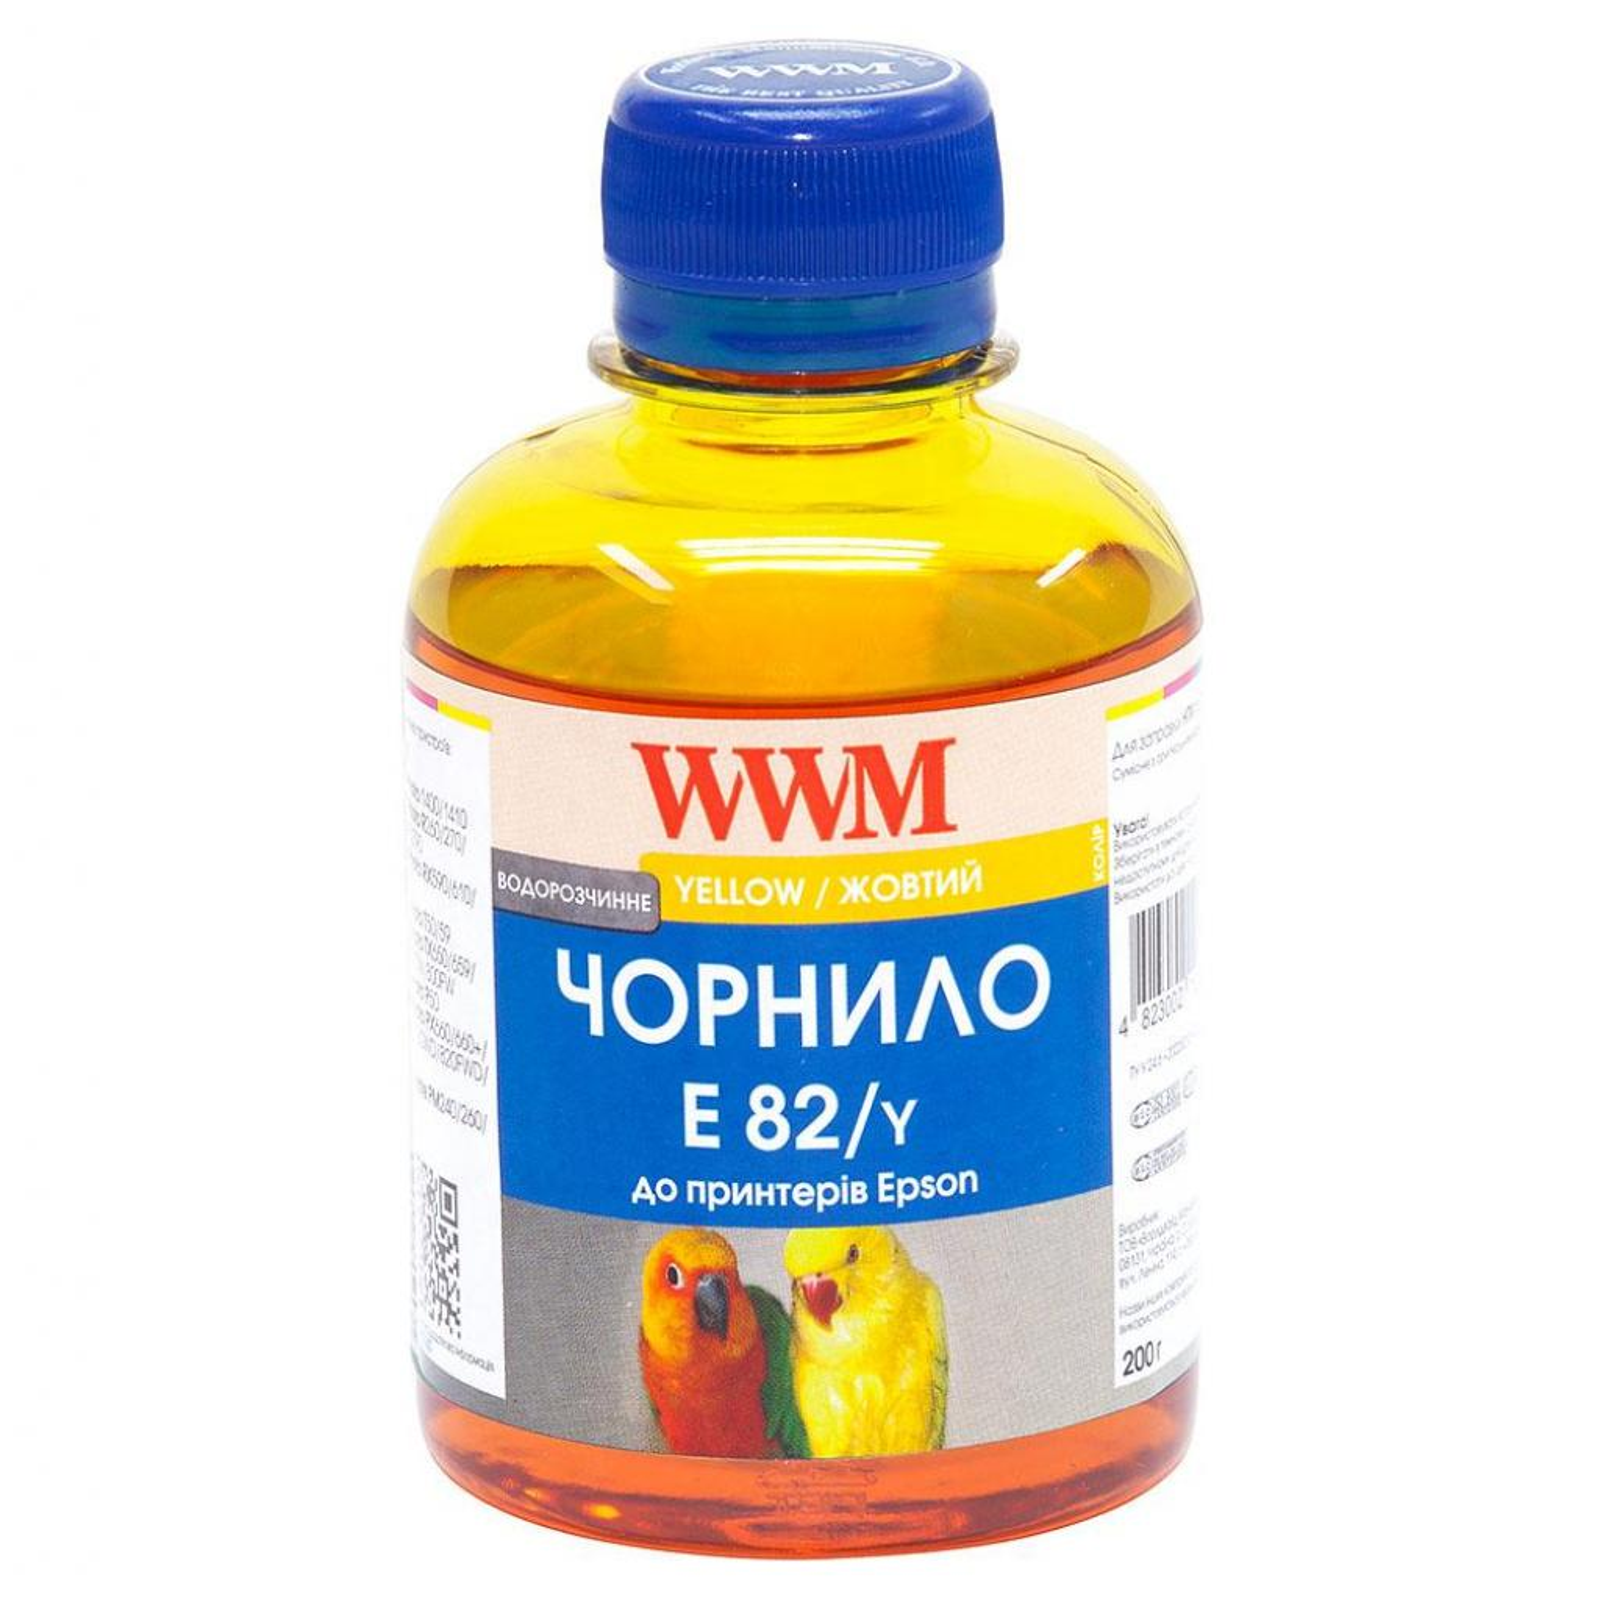 Чернила WWM EPSON StPhoto R270/290 Yellow (E82/Y)